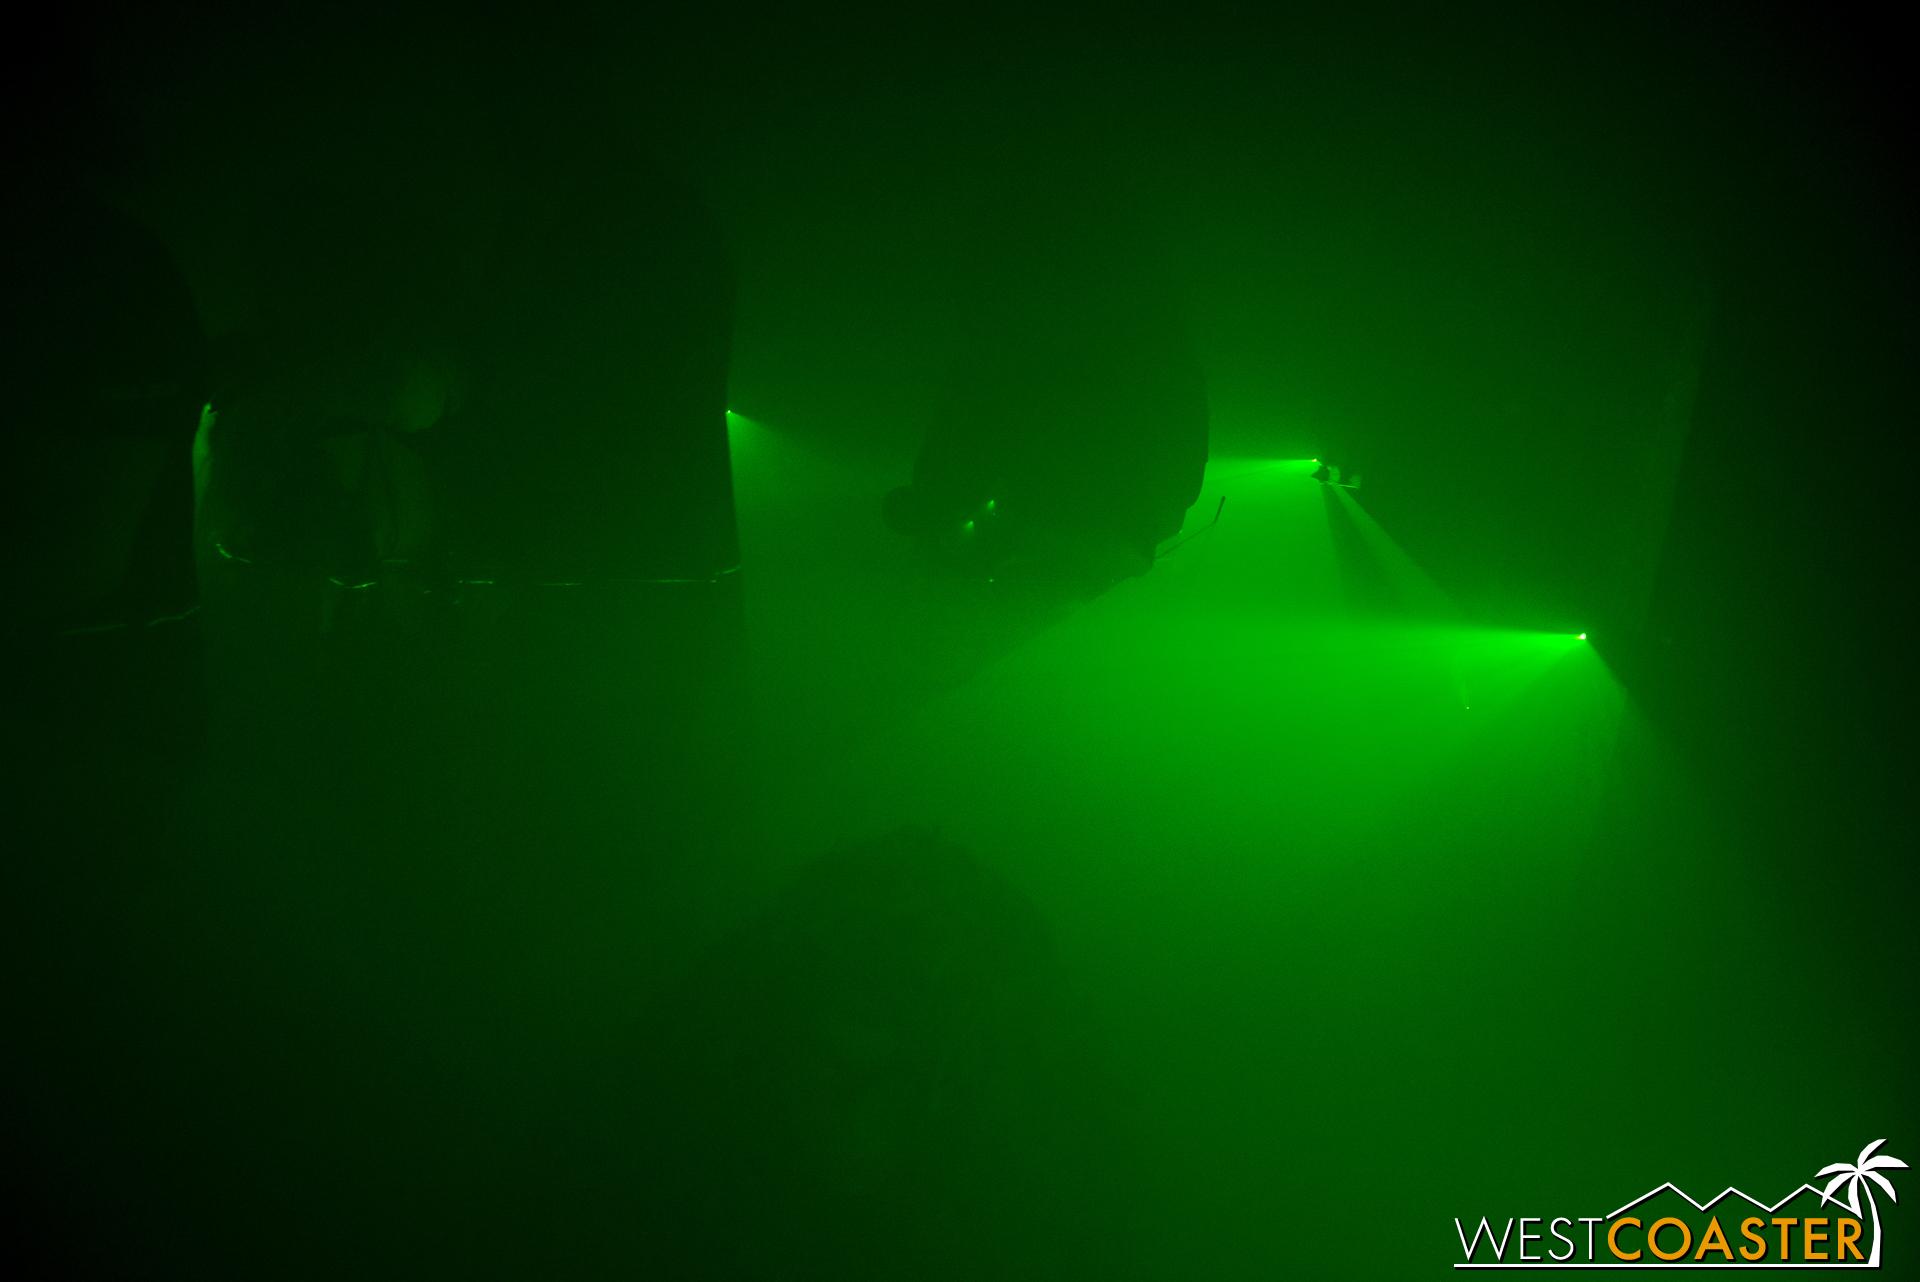 DarkHarbor-17_1009-05-Intrepid-0010.jpg